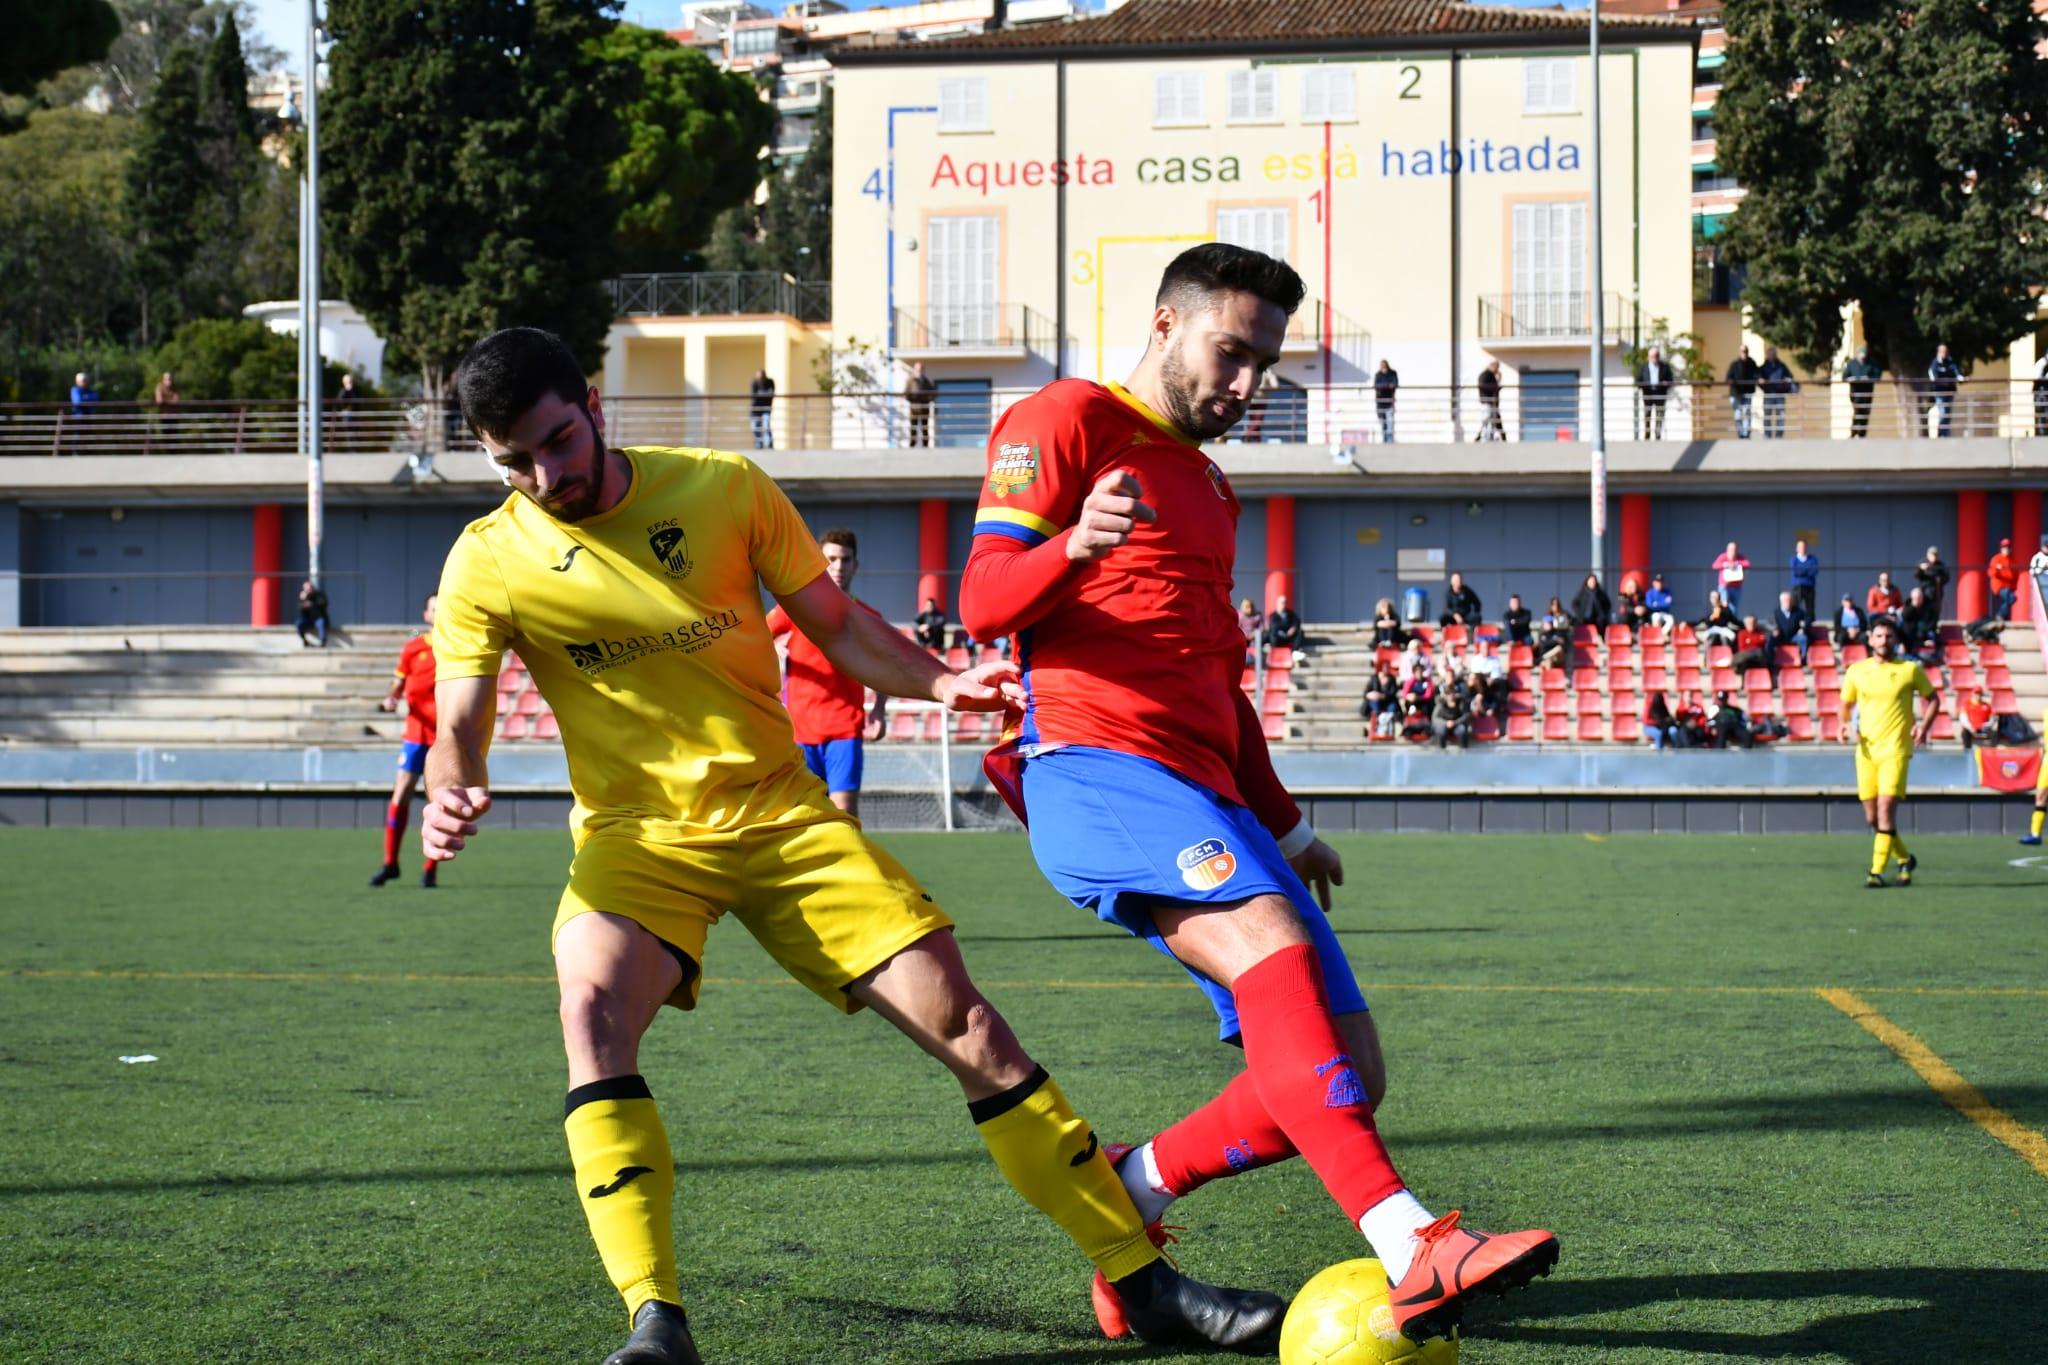 Ahufi Almacelles